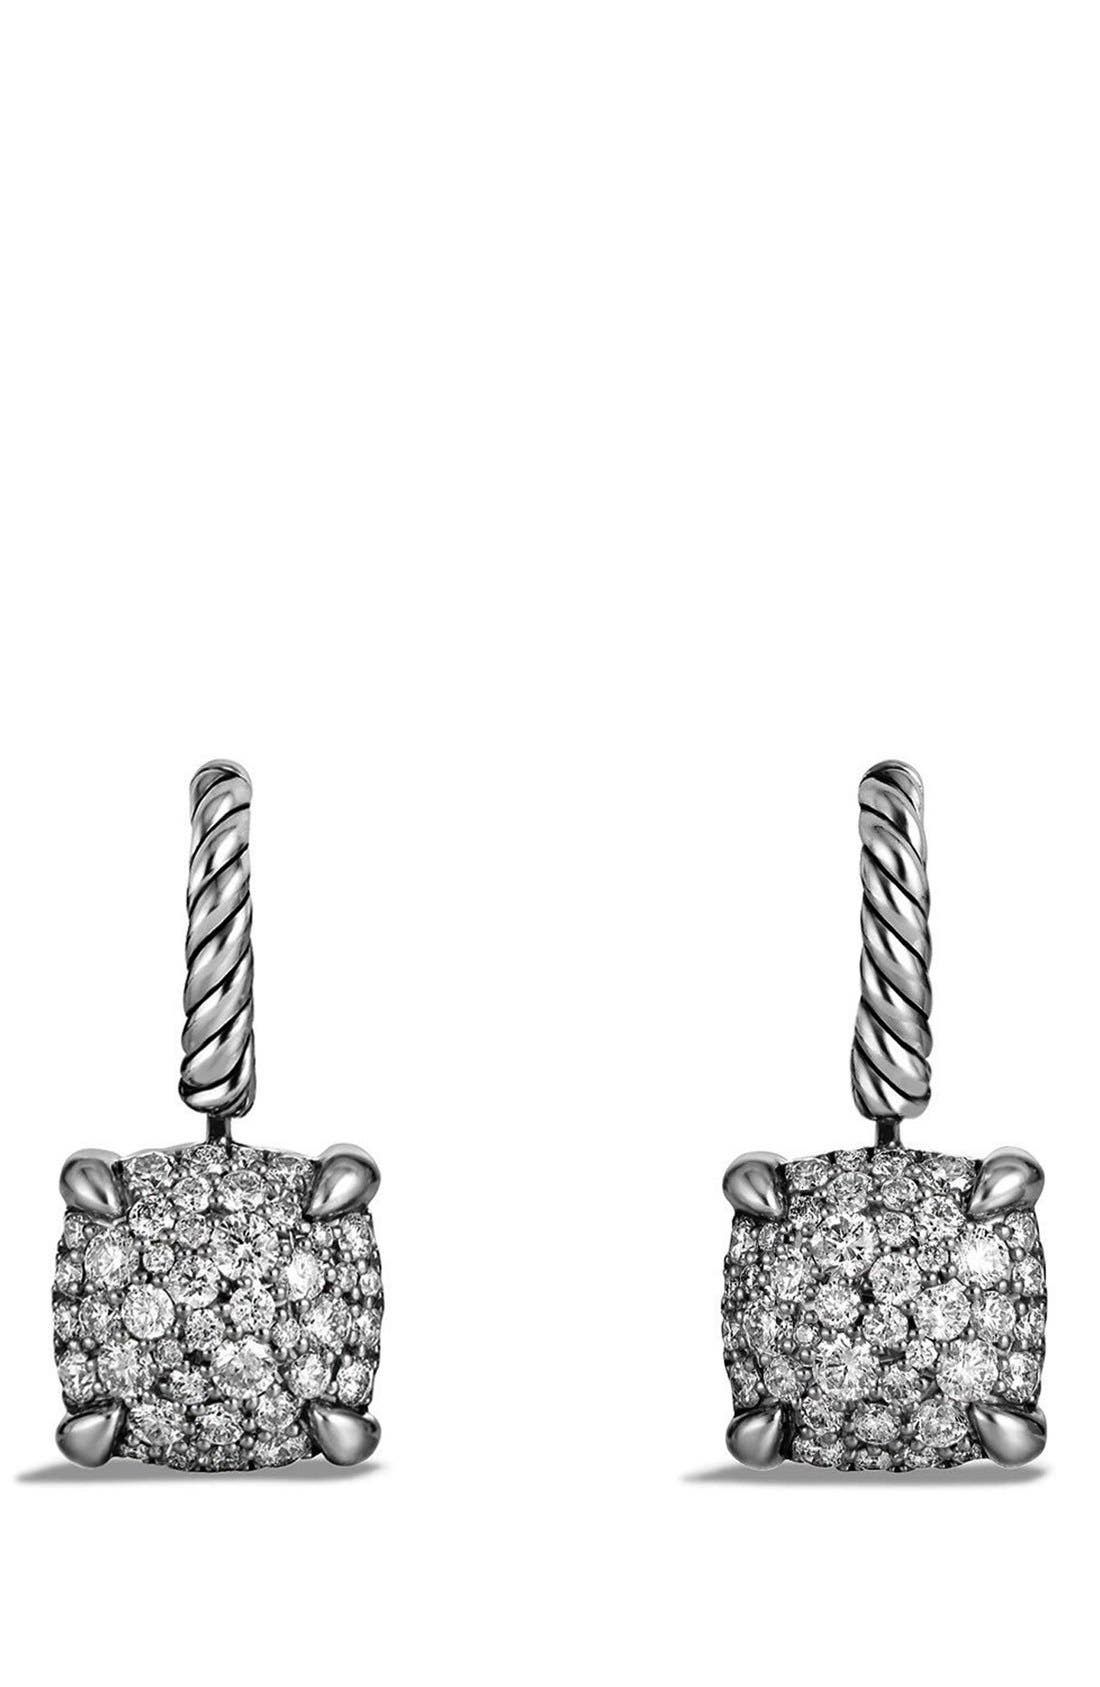 Main Image - David Yurman 'Châtelaine' Drop Earrings with Diamonds